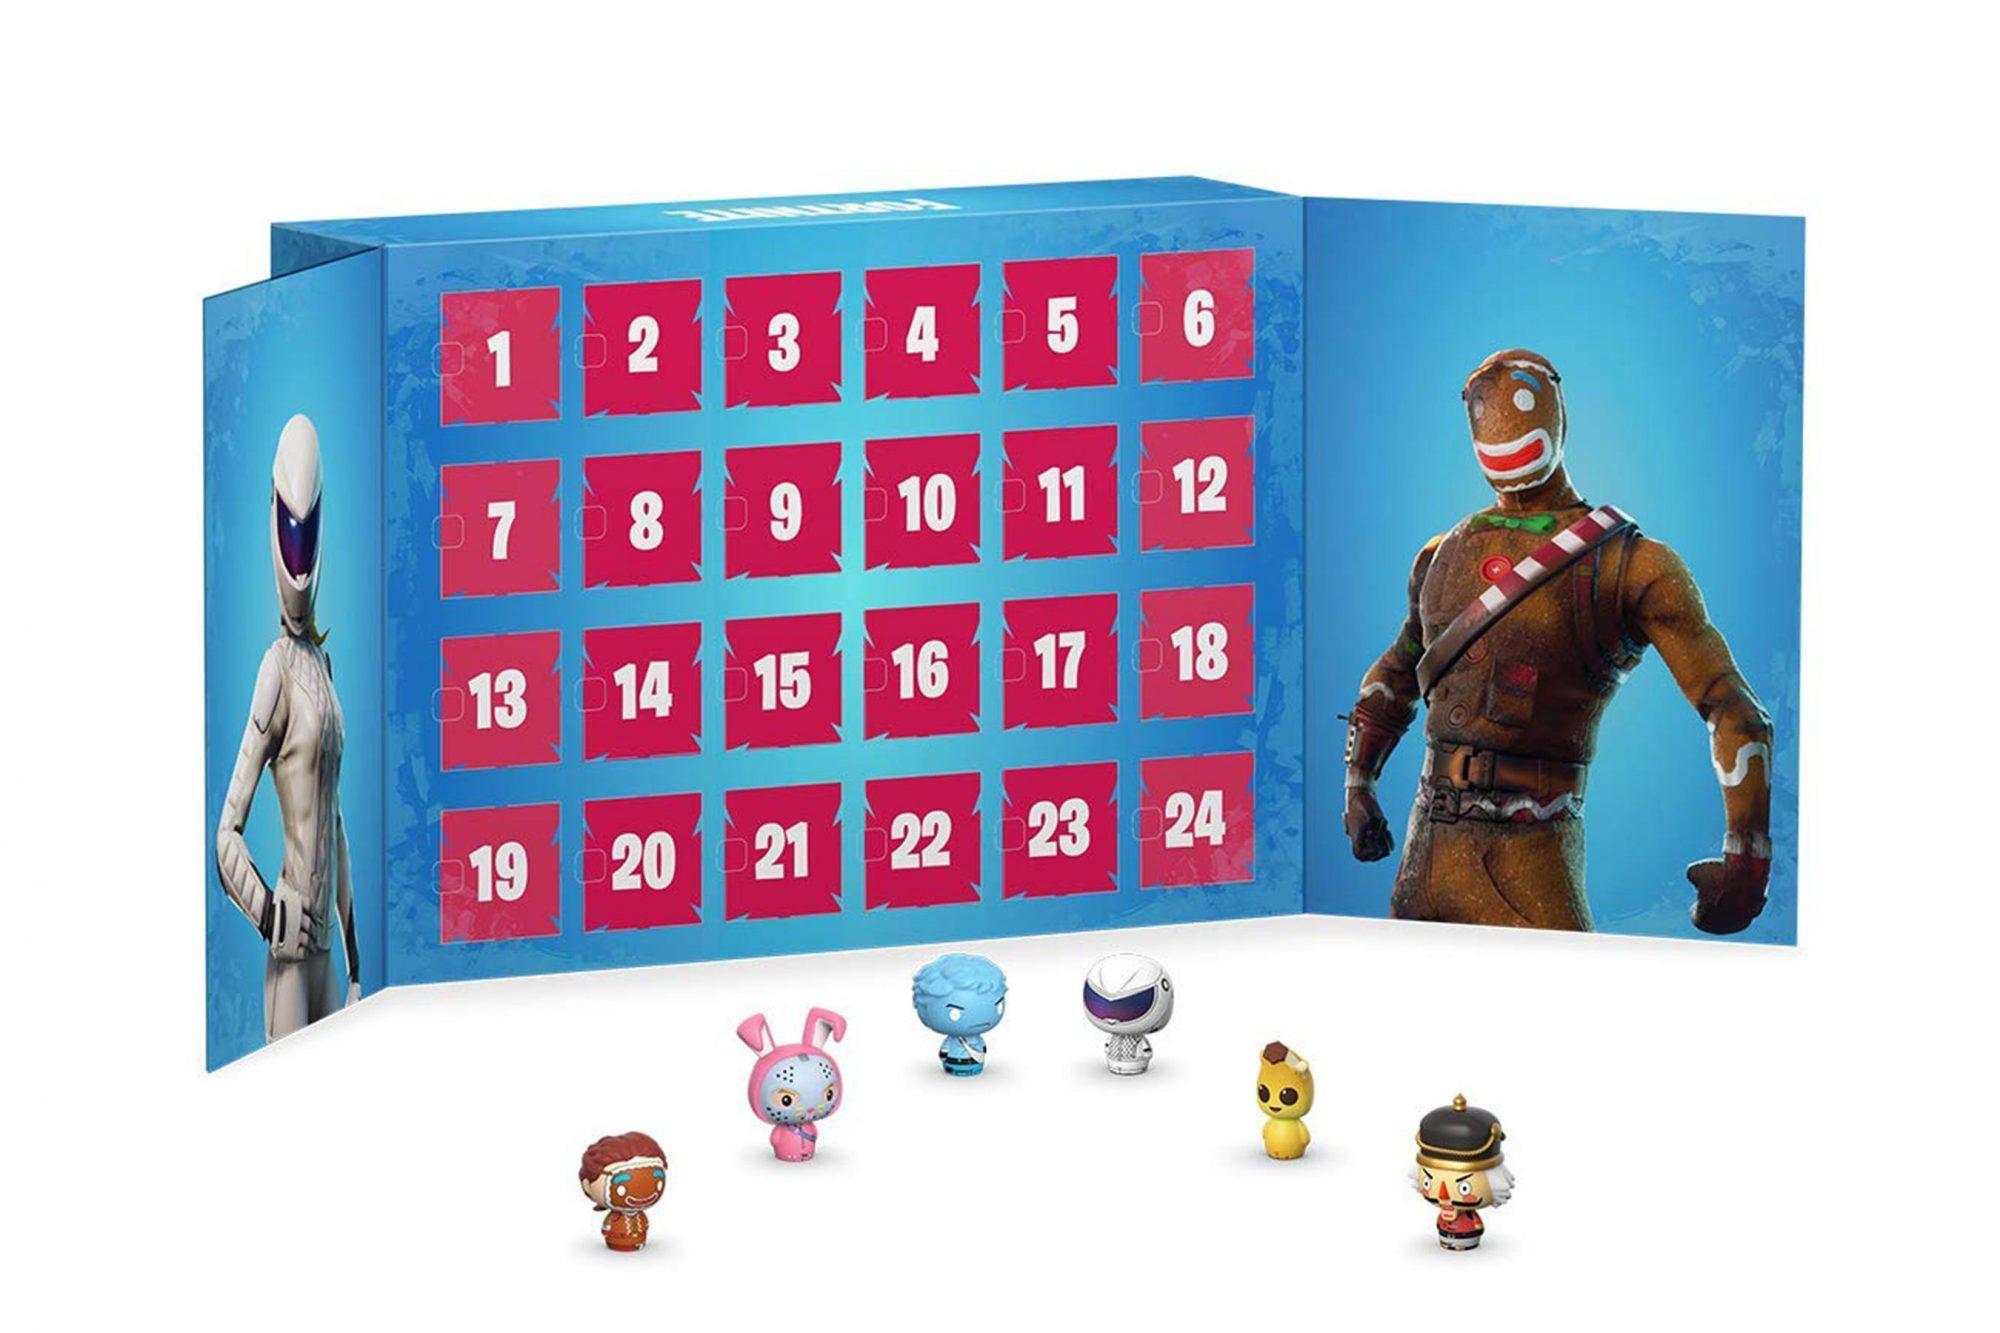 Fortnite-advent-calendar2